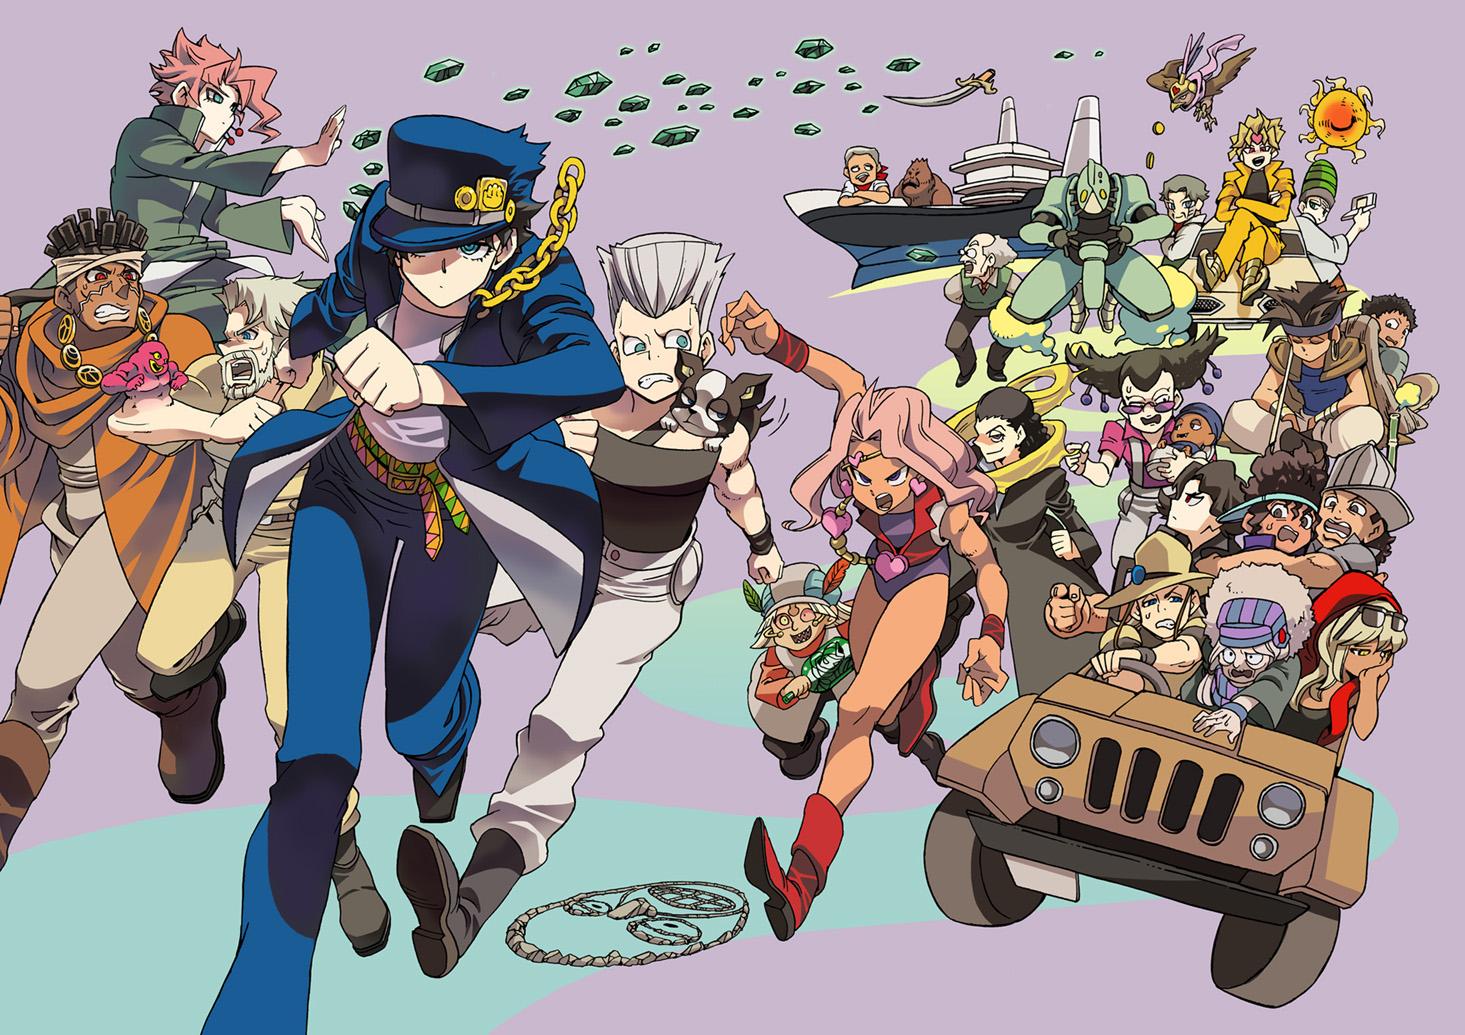 Anime Wallpapers Jojos Bizarre Adventure   Anime Wallpaper 1465x1035